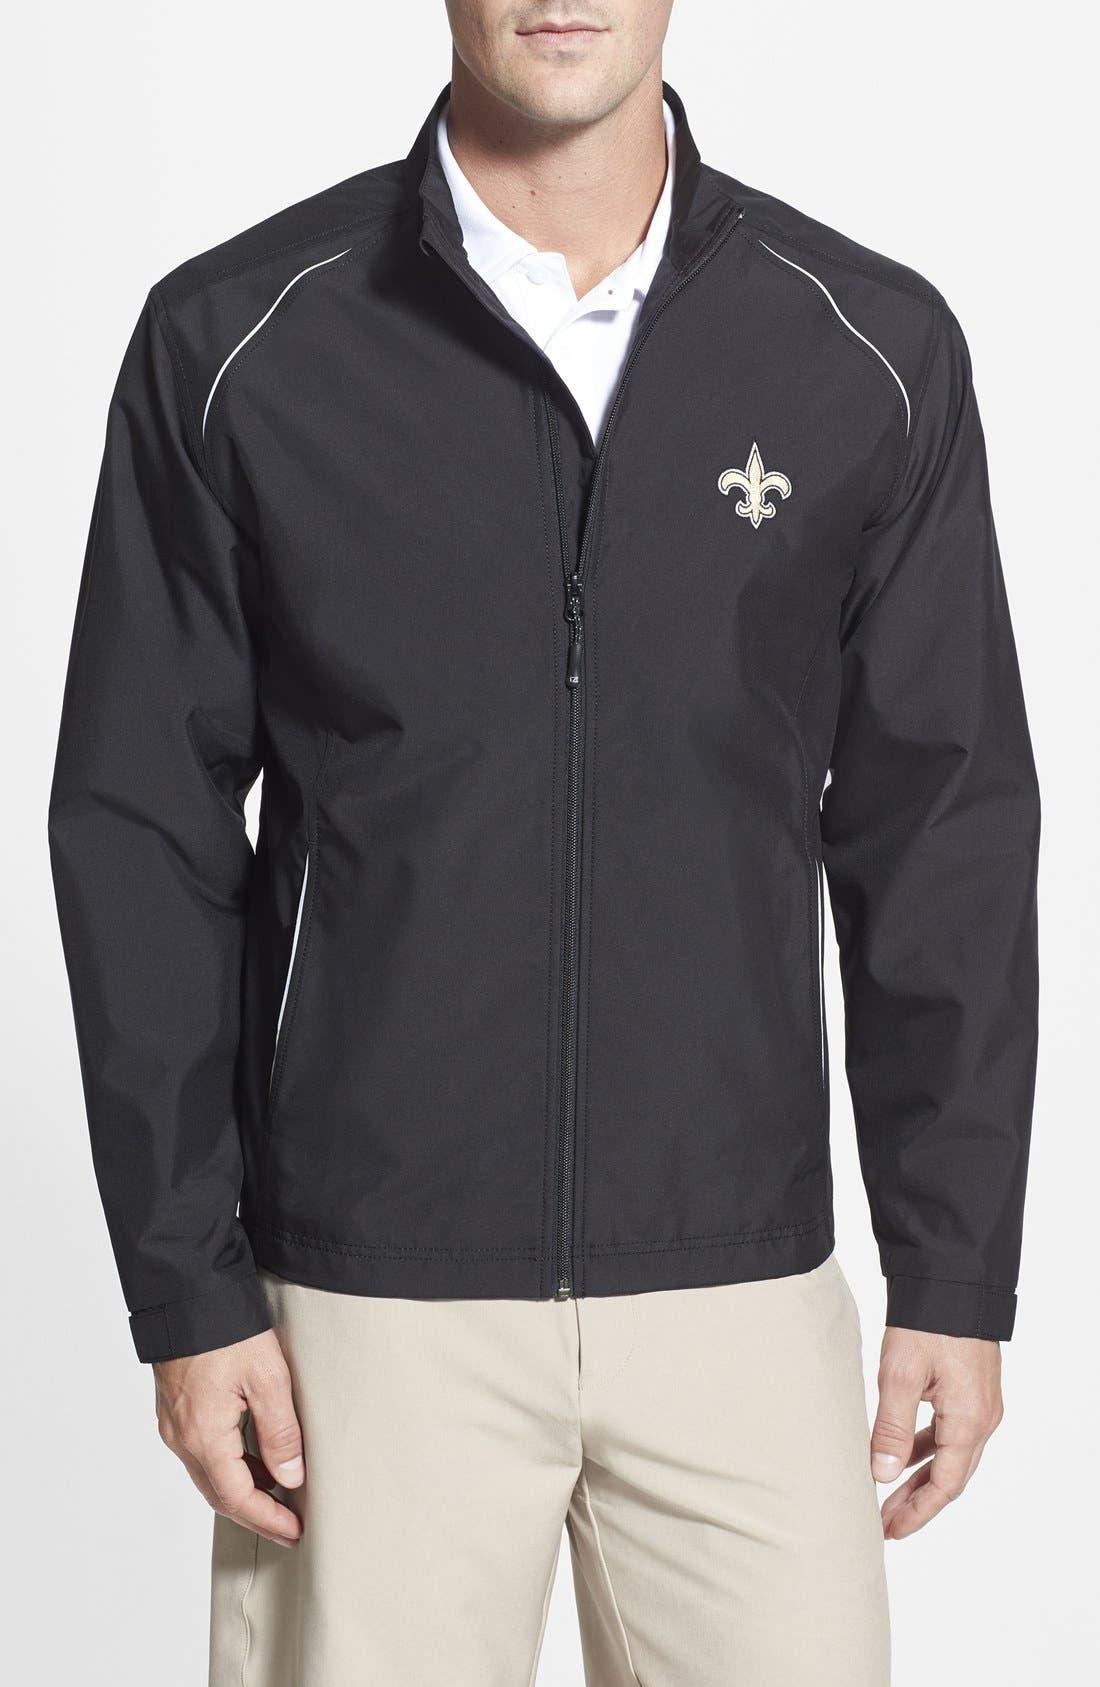 Alternate Image 1 Selected - Cutter & Buck New Orleans Saints - Beacon WeatherTec Wind & Water Resistant Jacket